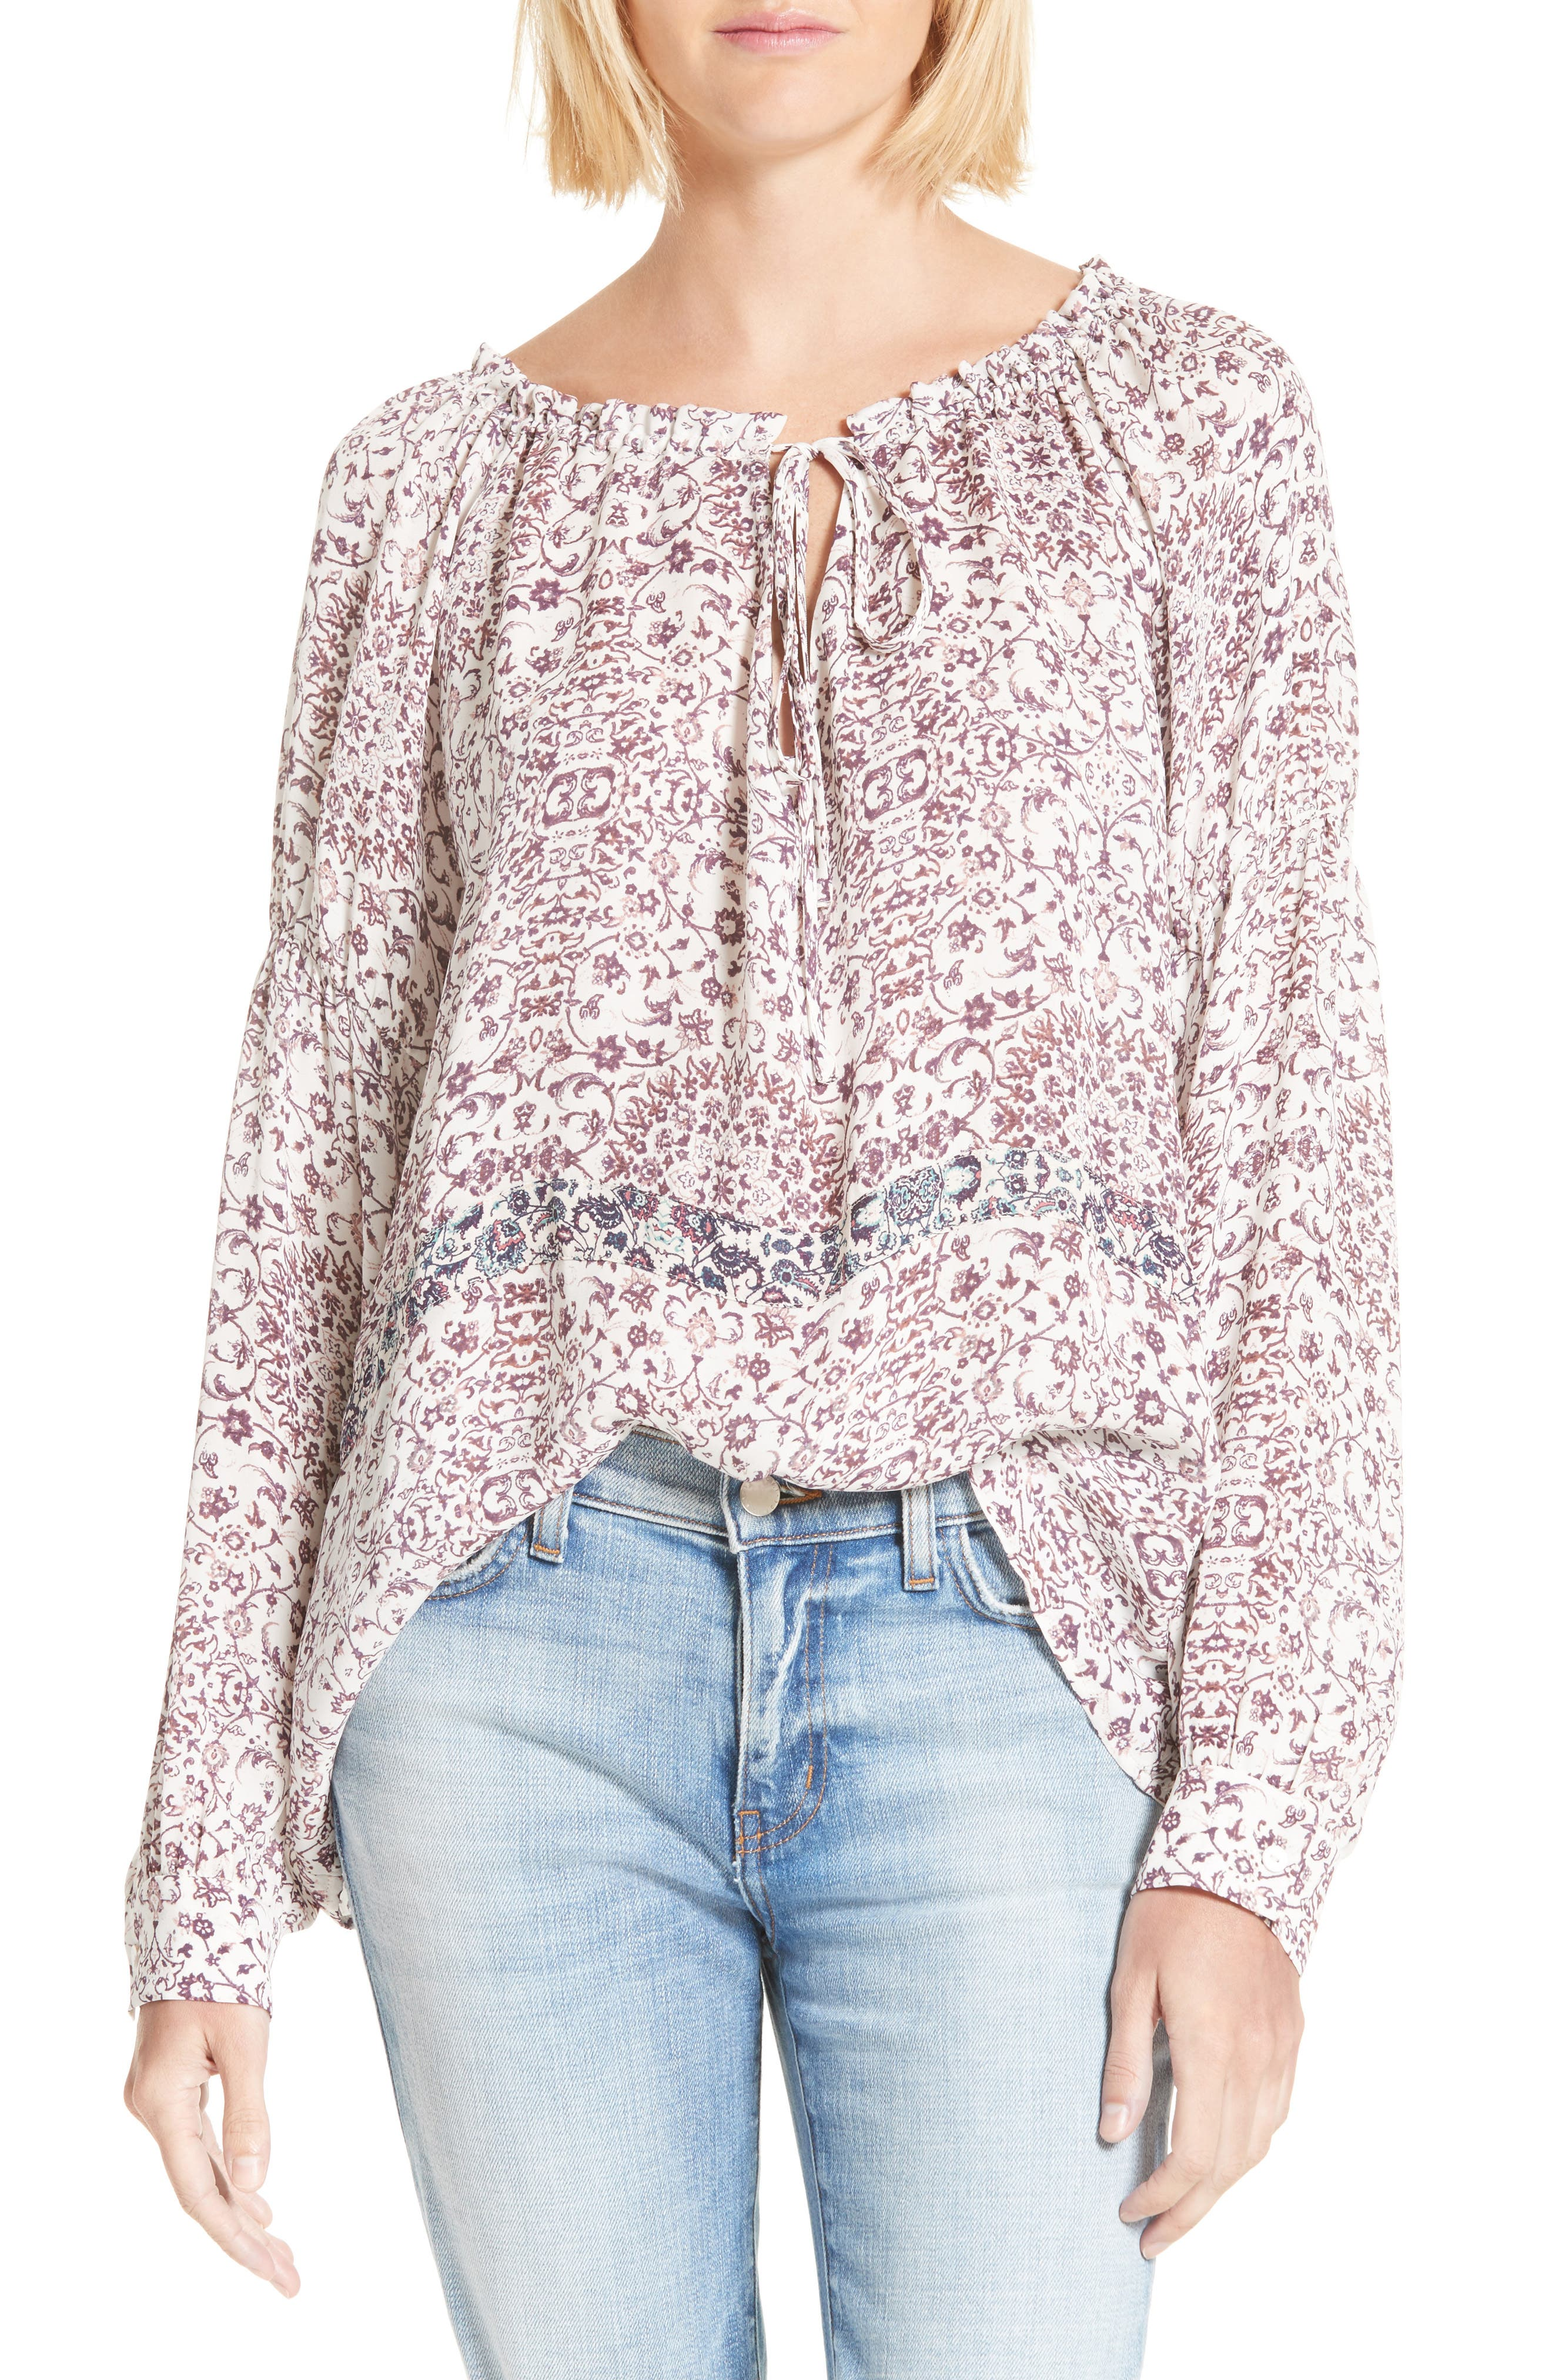 L'AGENCE Crawford Floral Print Silk Blouse